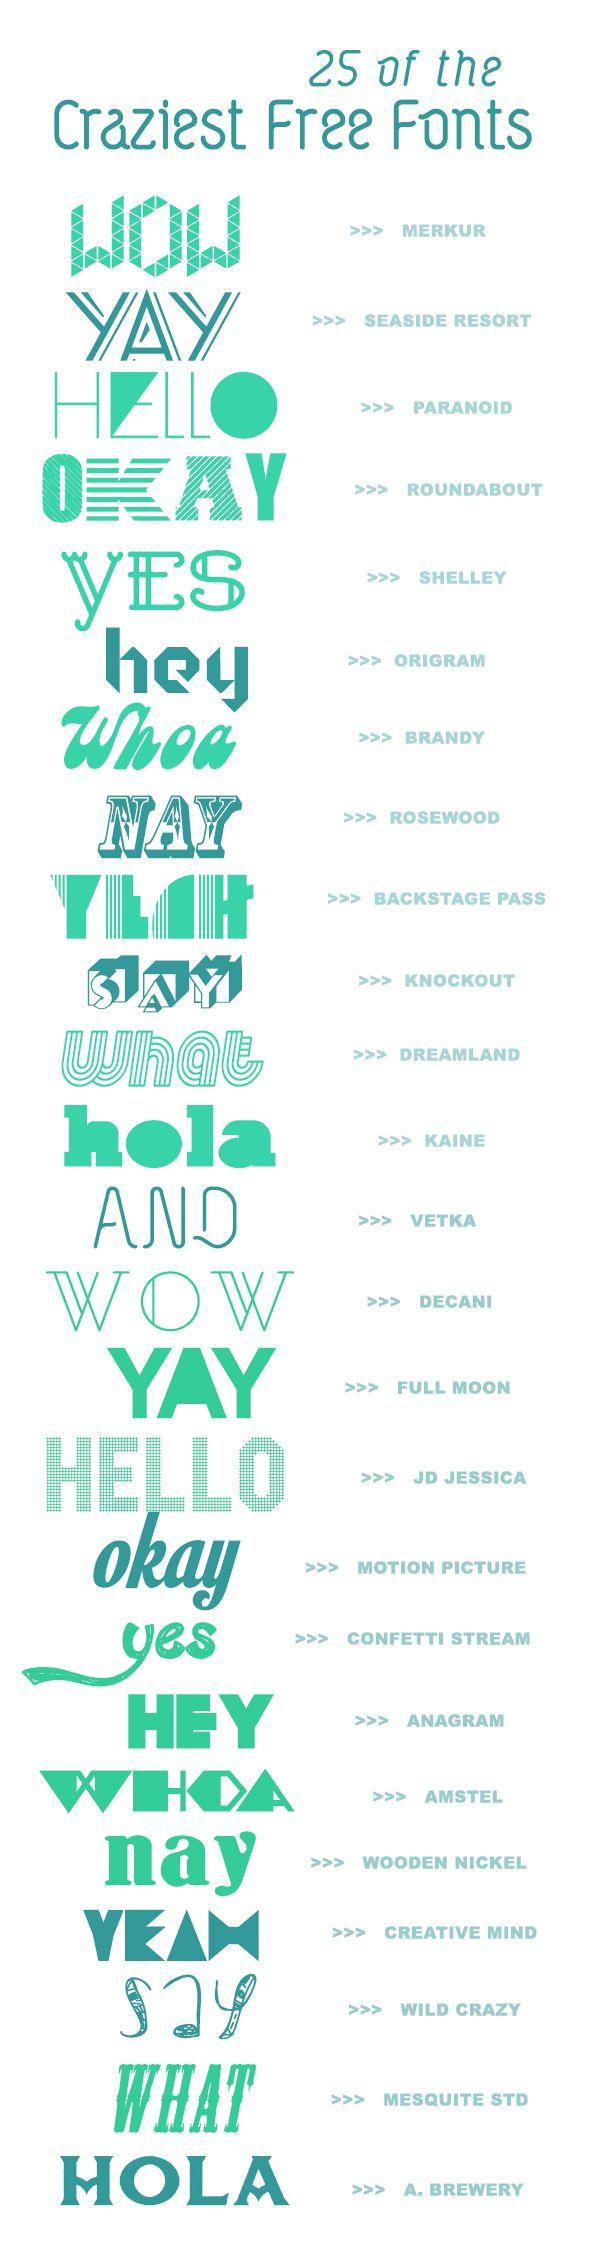 25 crazy creative fonts   a subtle revelry